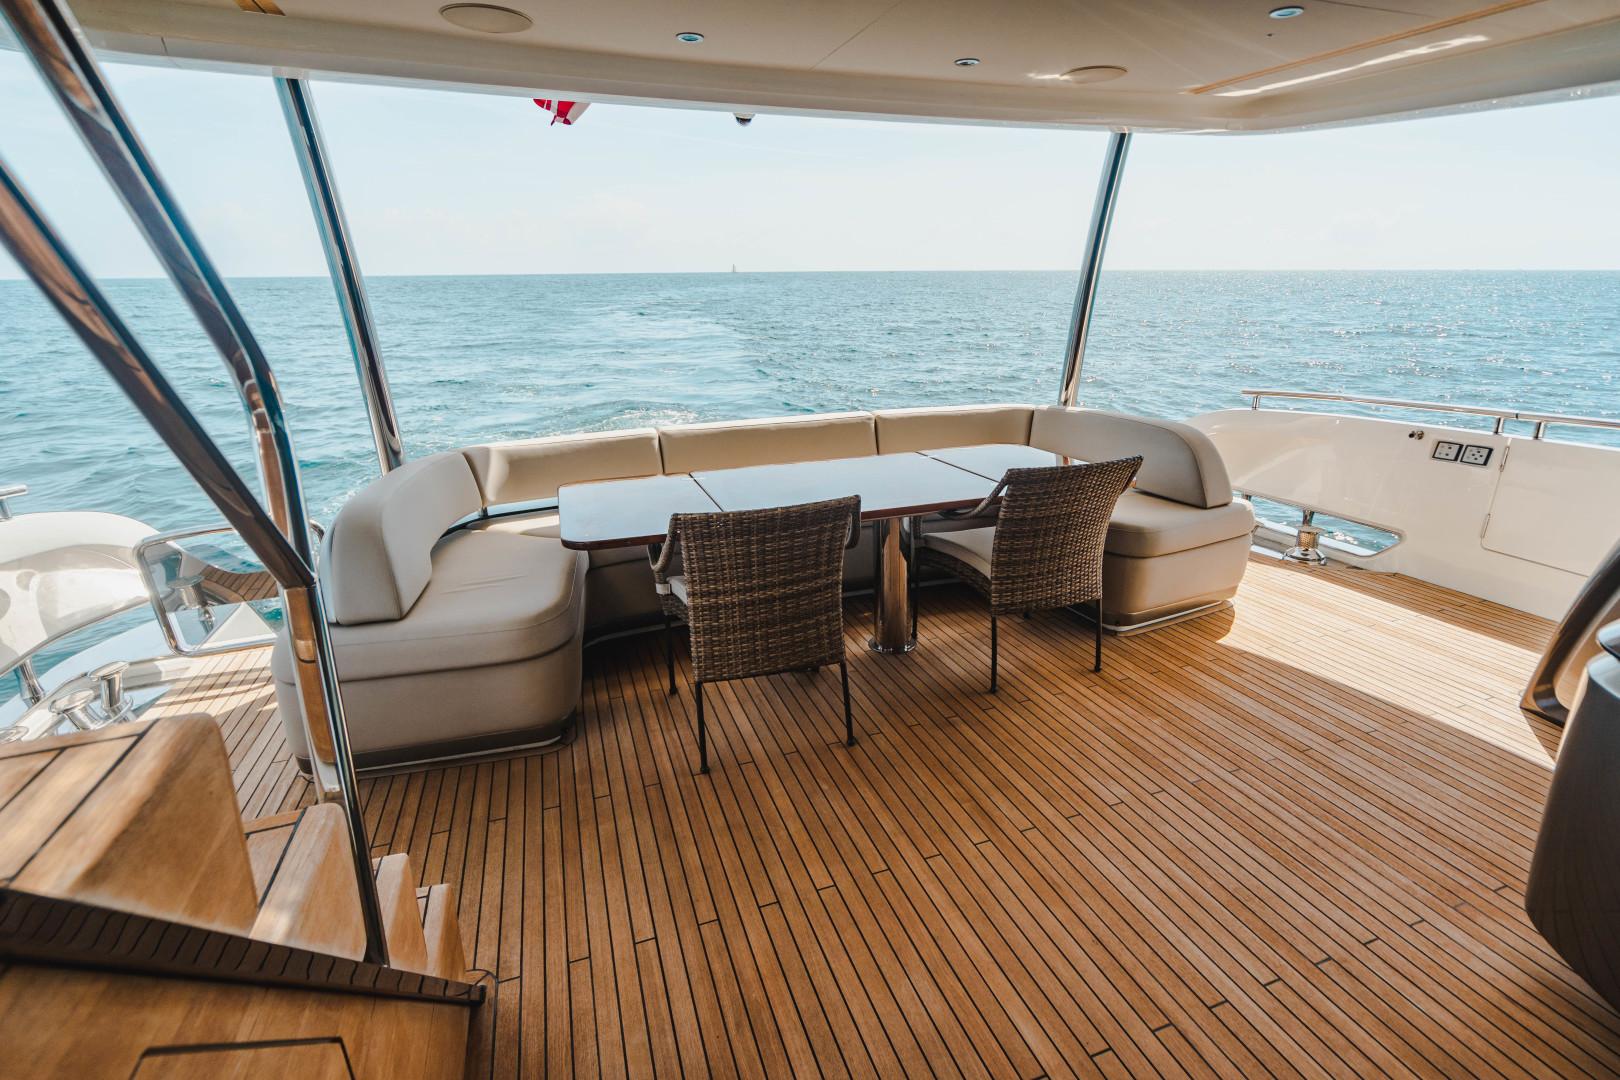 Princess-Y85  2019-Splash Delray Beach-Florida-United States-1631611 | Thumbnail